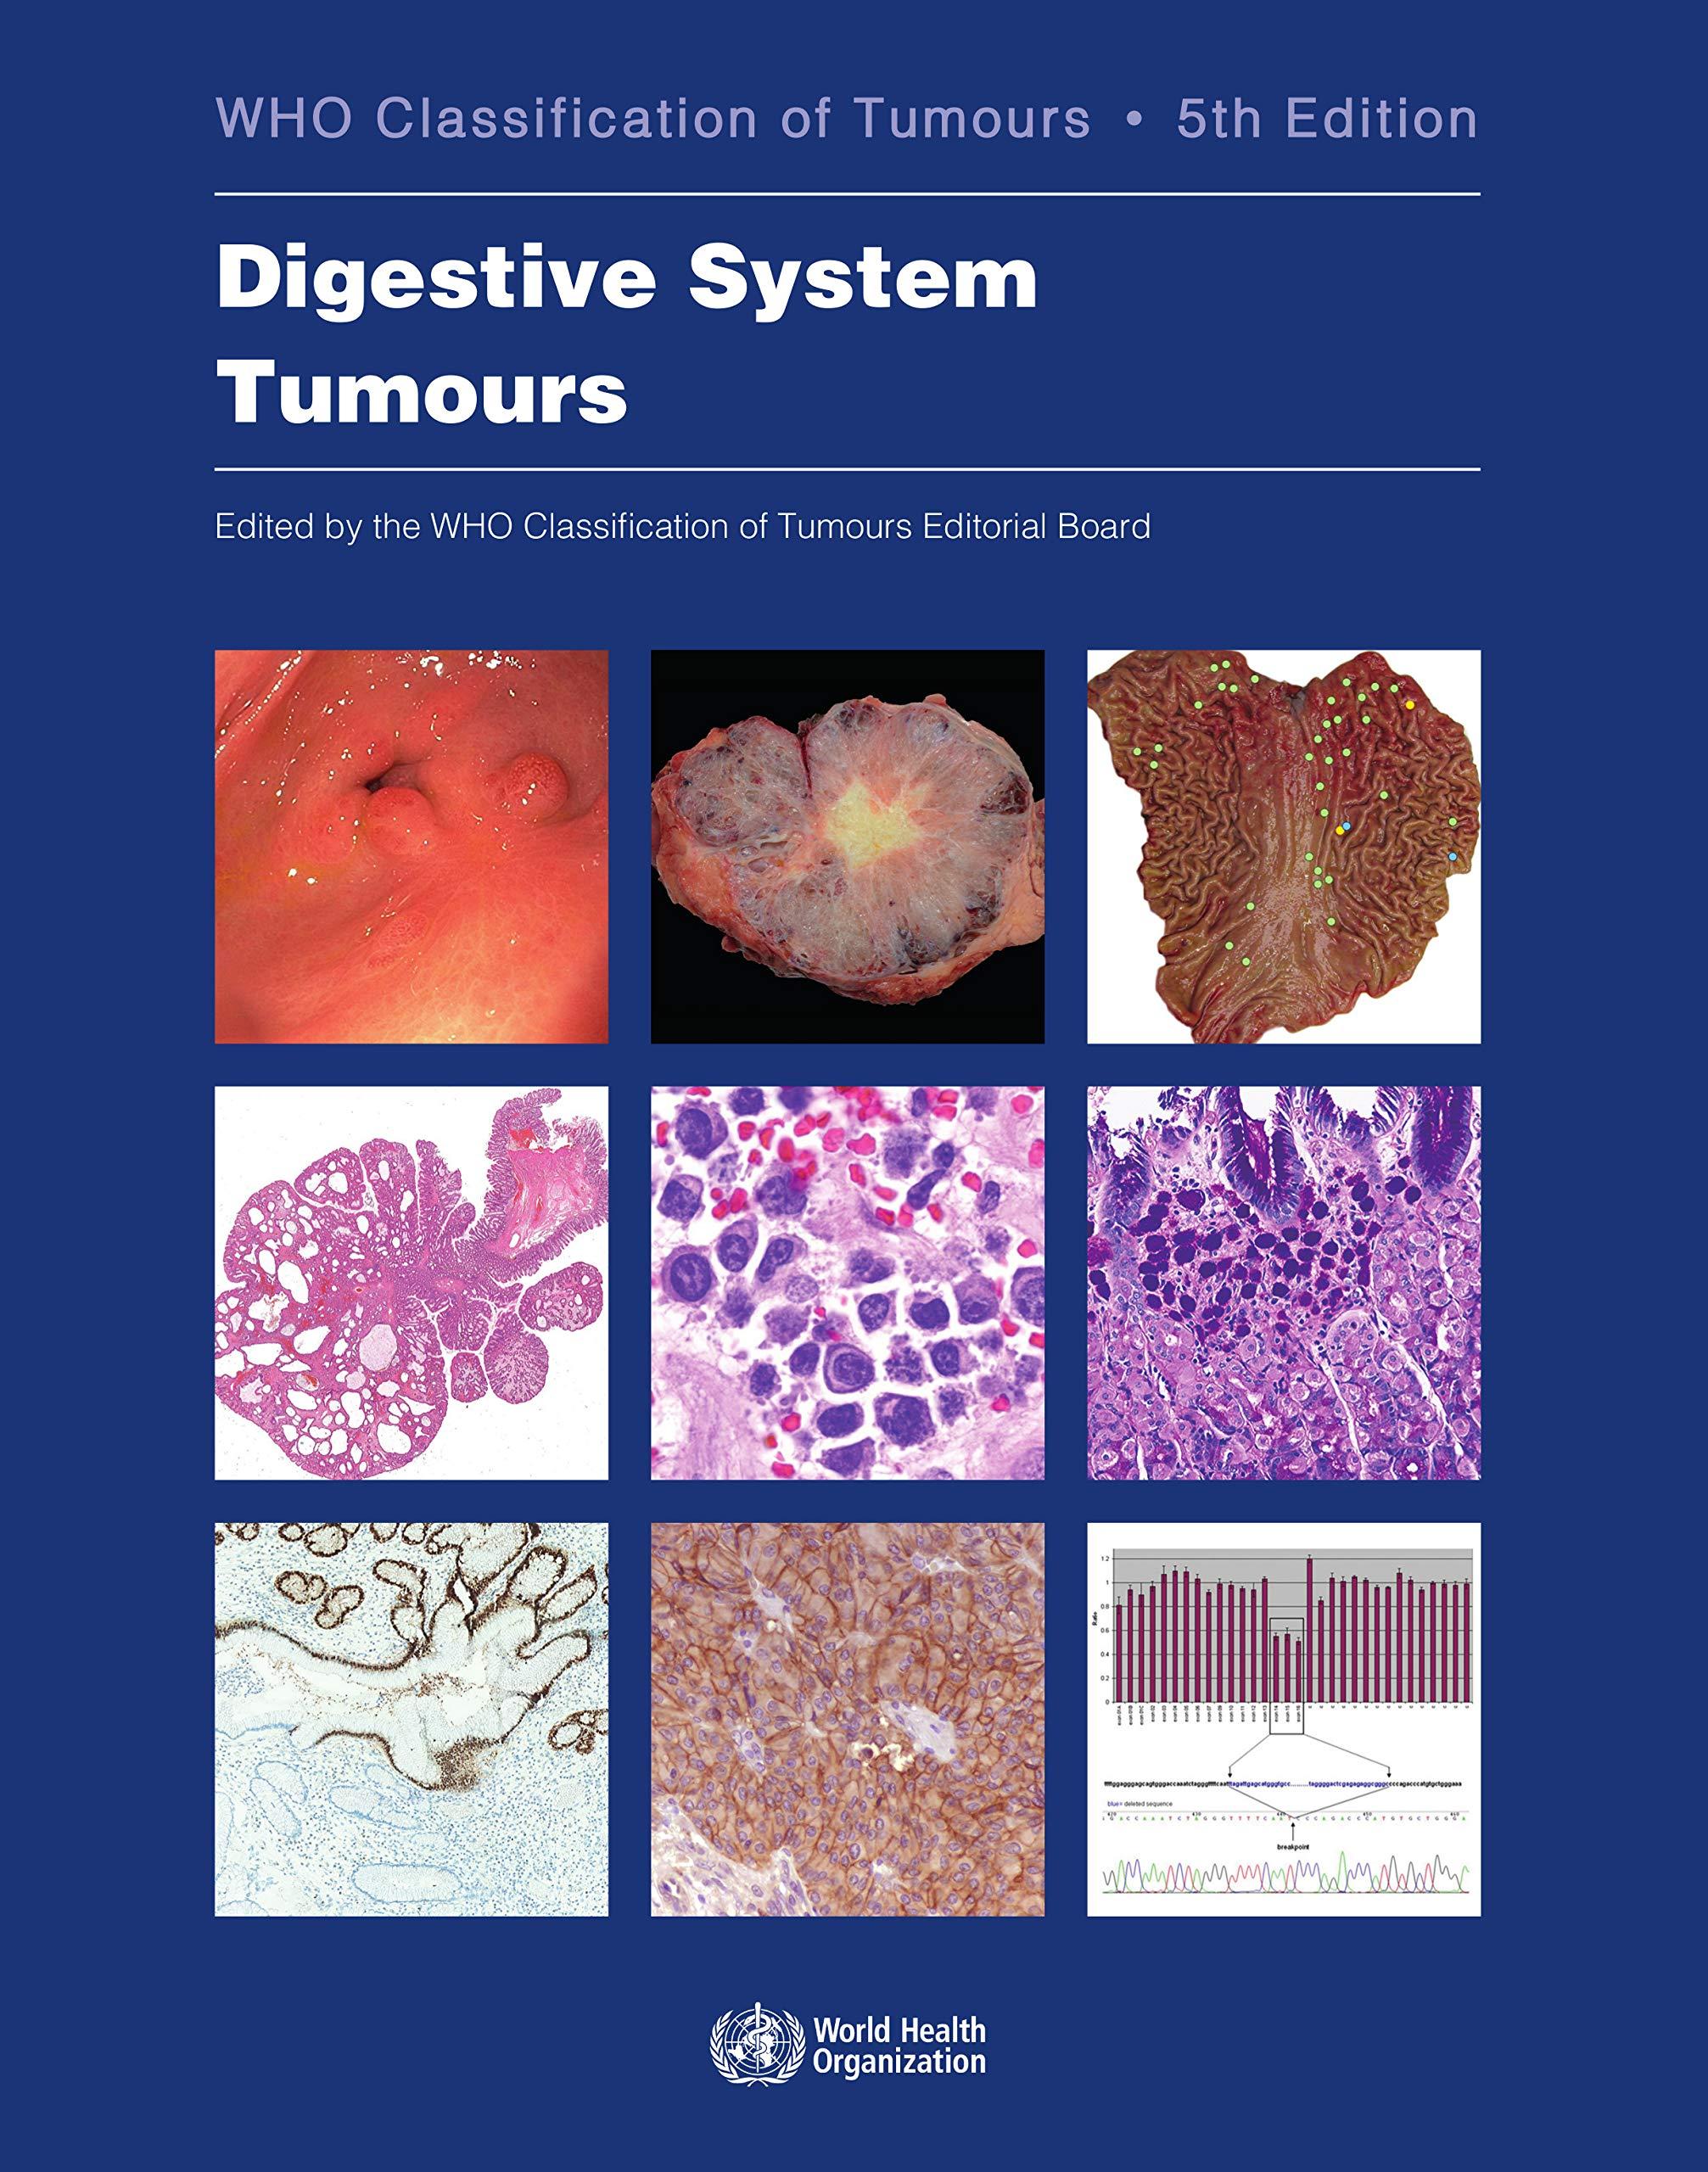 Digestive System Tumours (Medicine) by World Health Organization